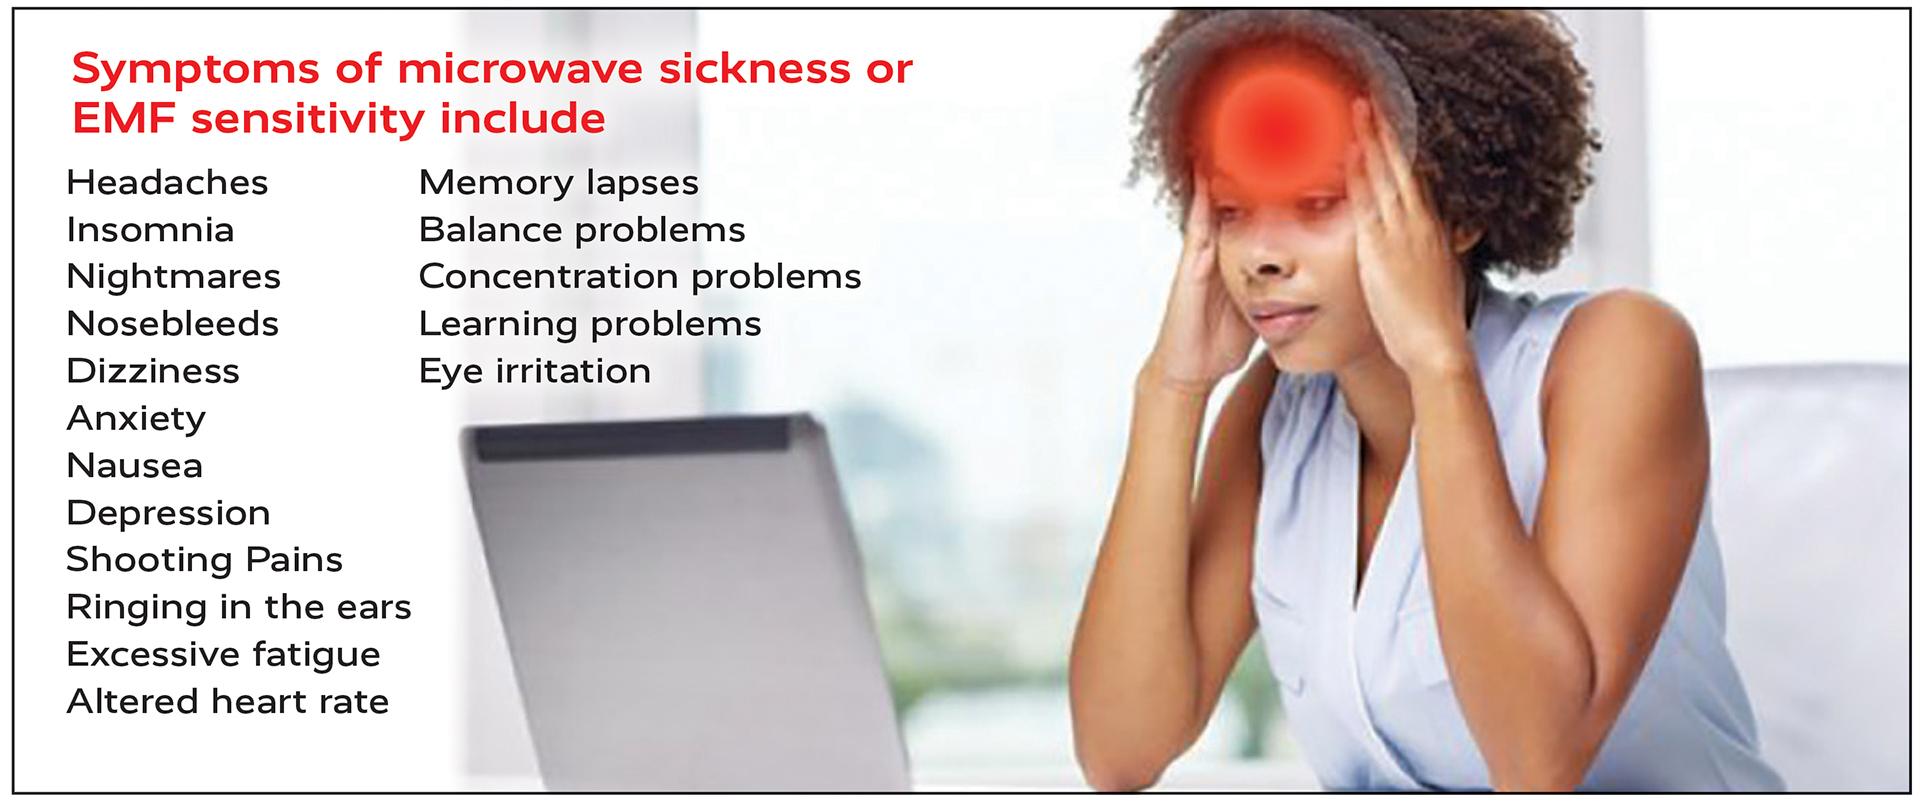 Symptoms Of Emf From Soc Emf Interview